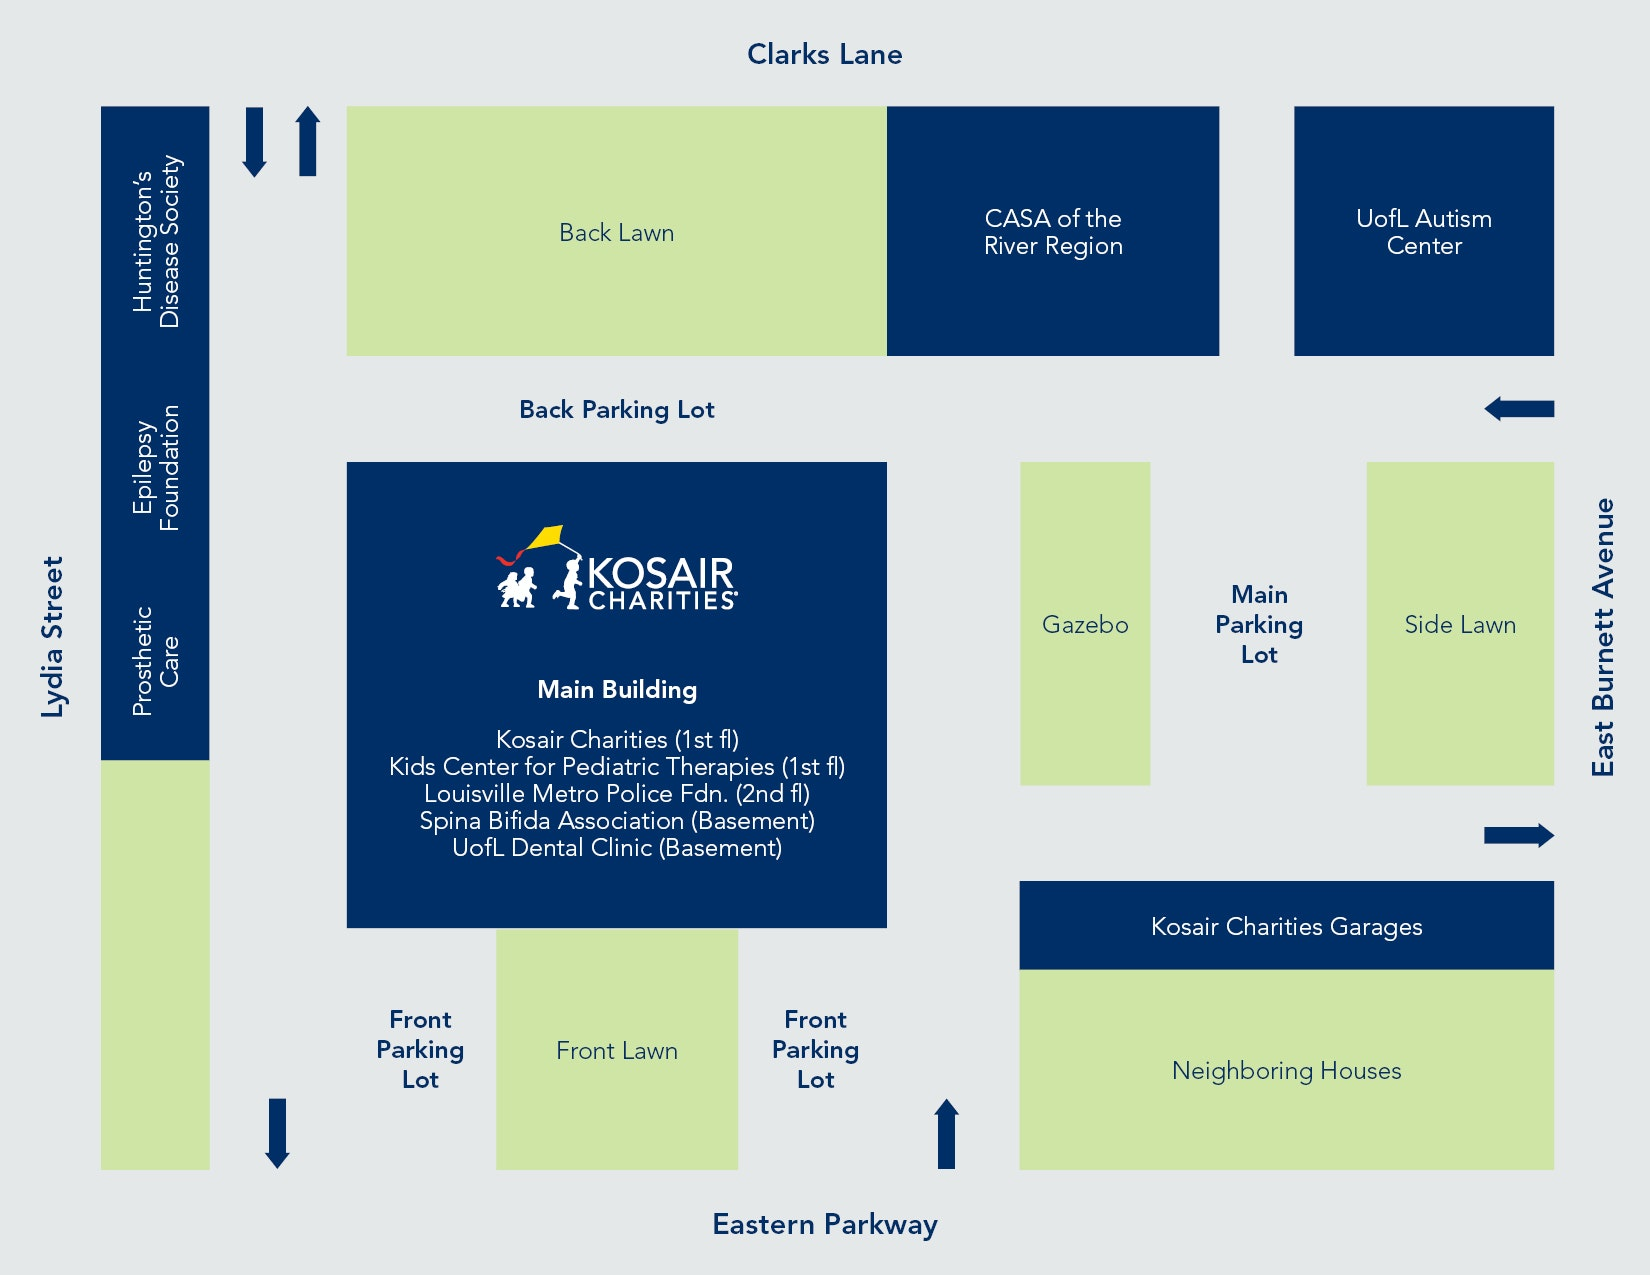 Basic Campus Map